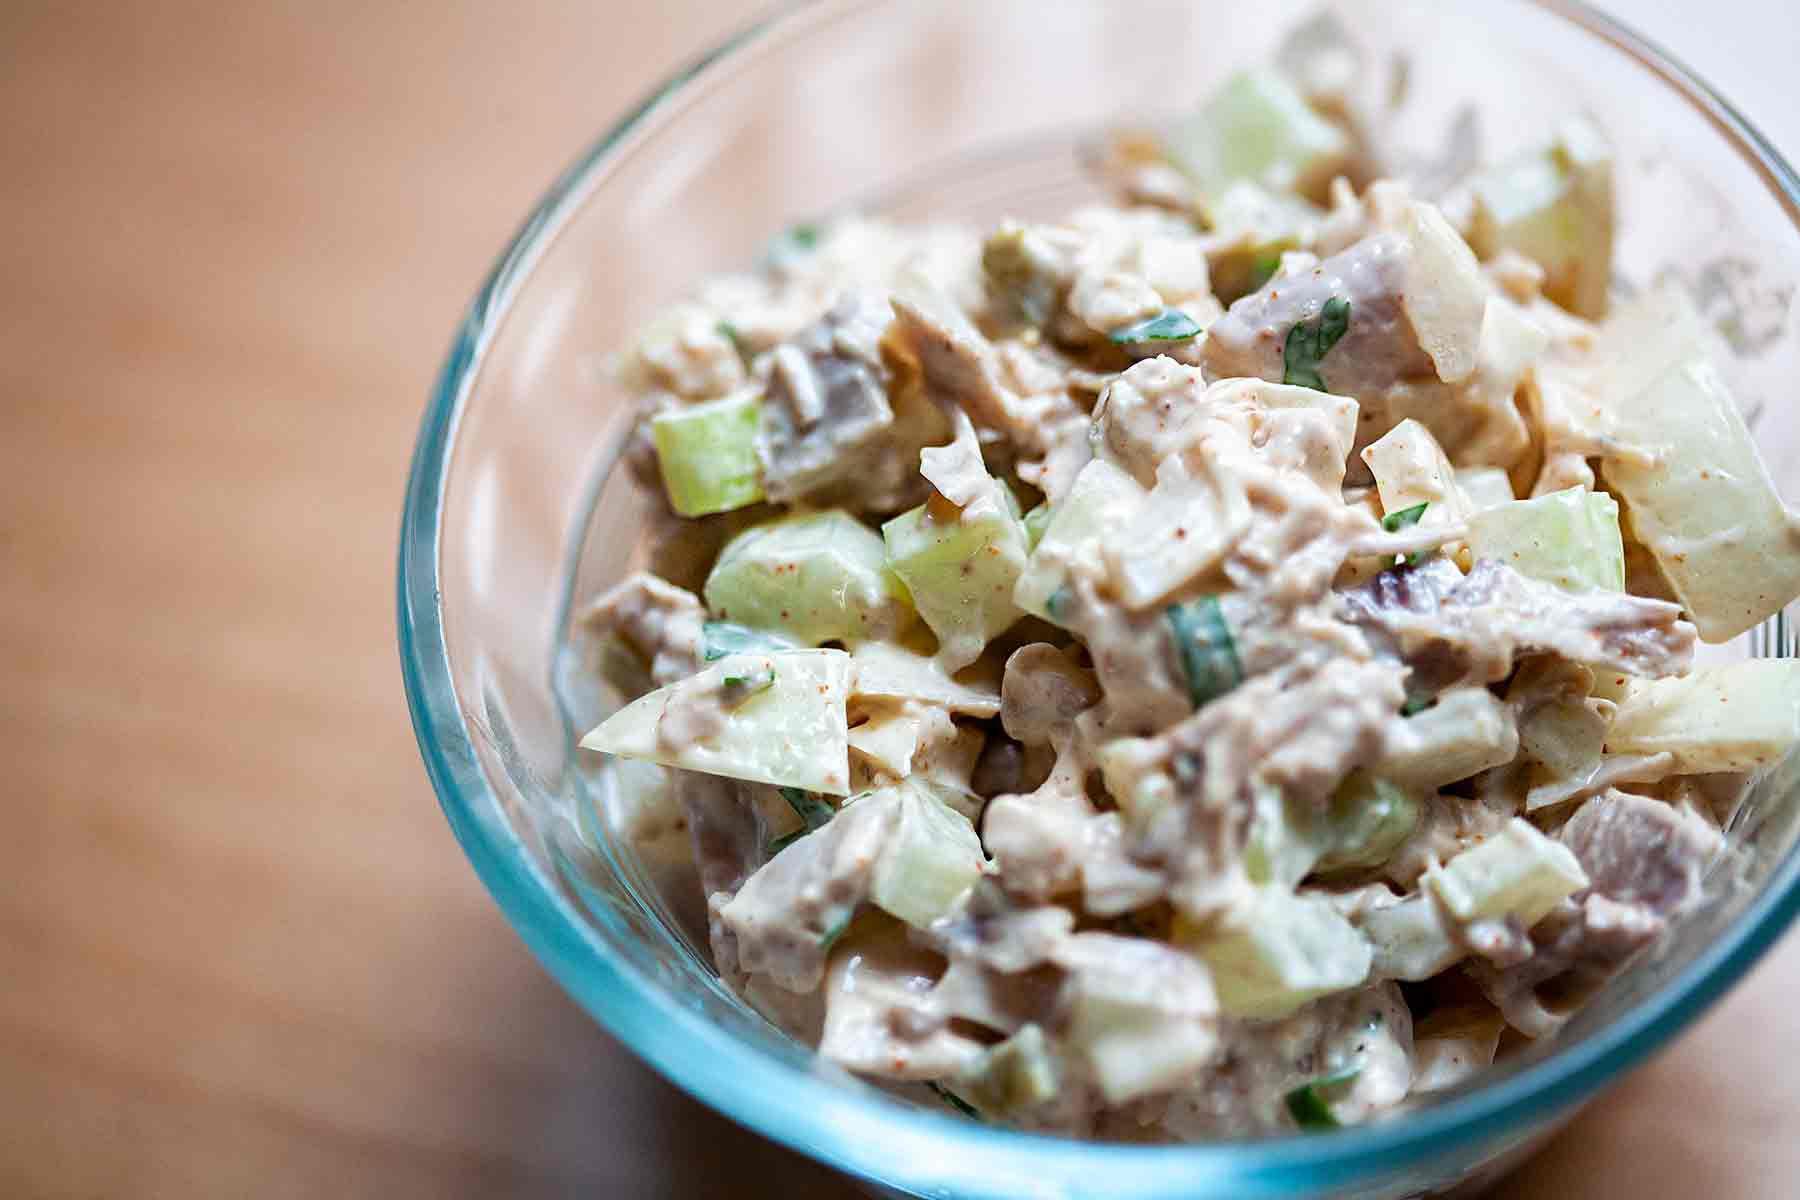 Chipotle Turkey Salad